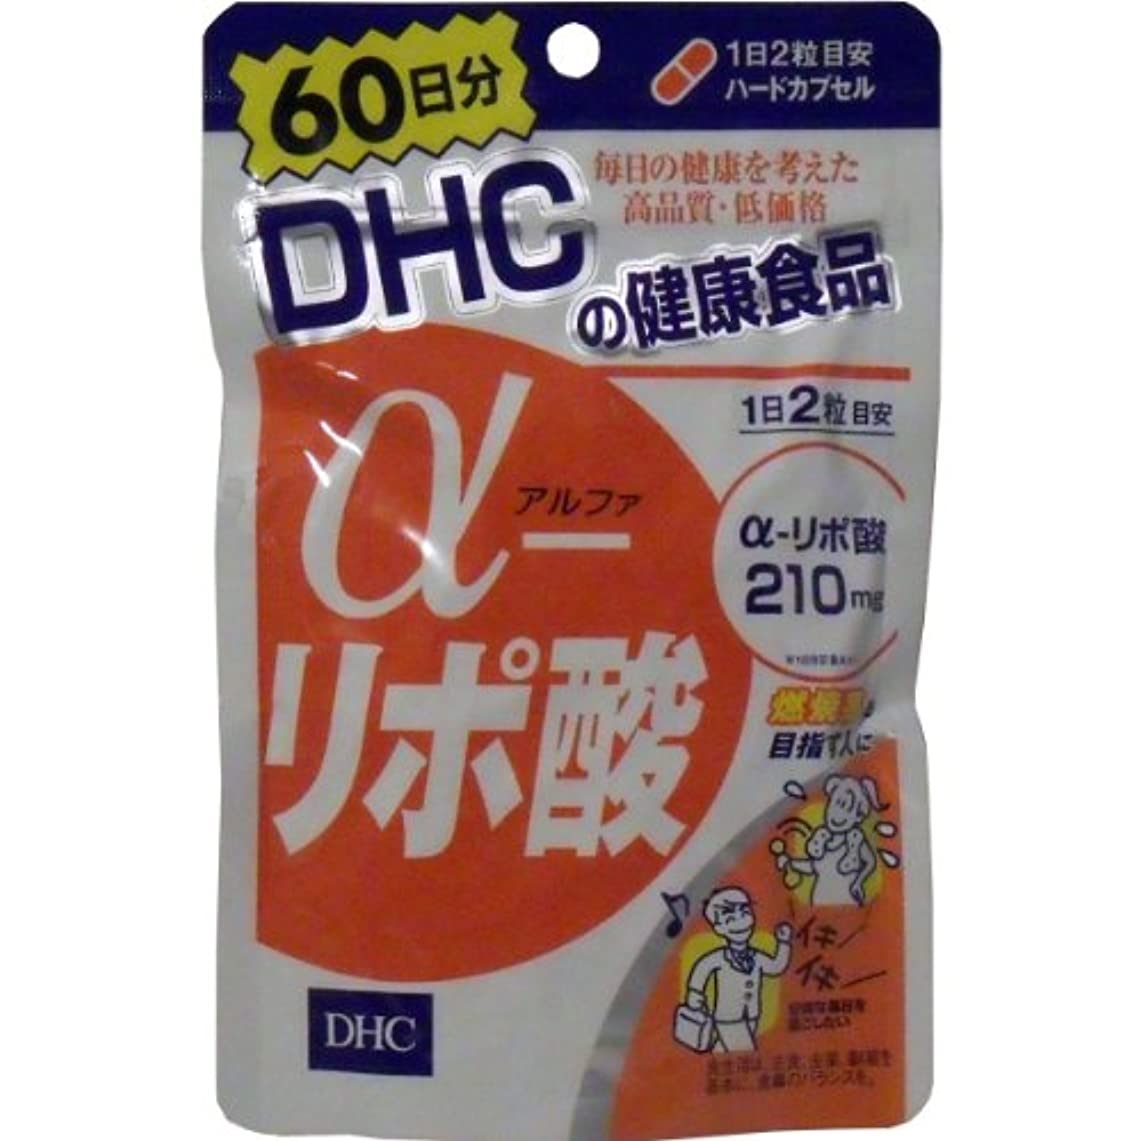 DHC α-リポ酸60日分 120粒×3個セット